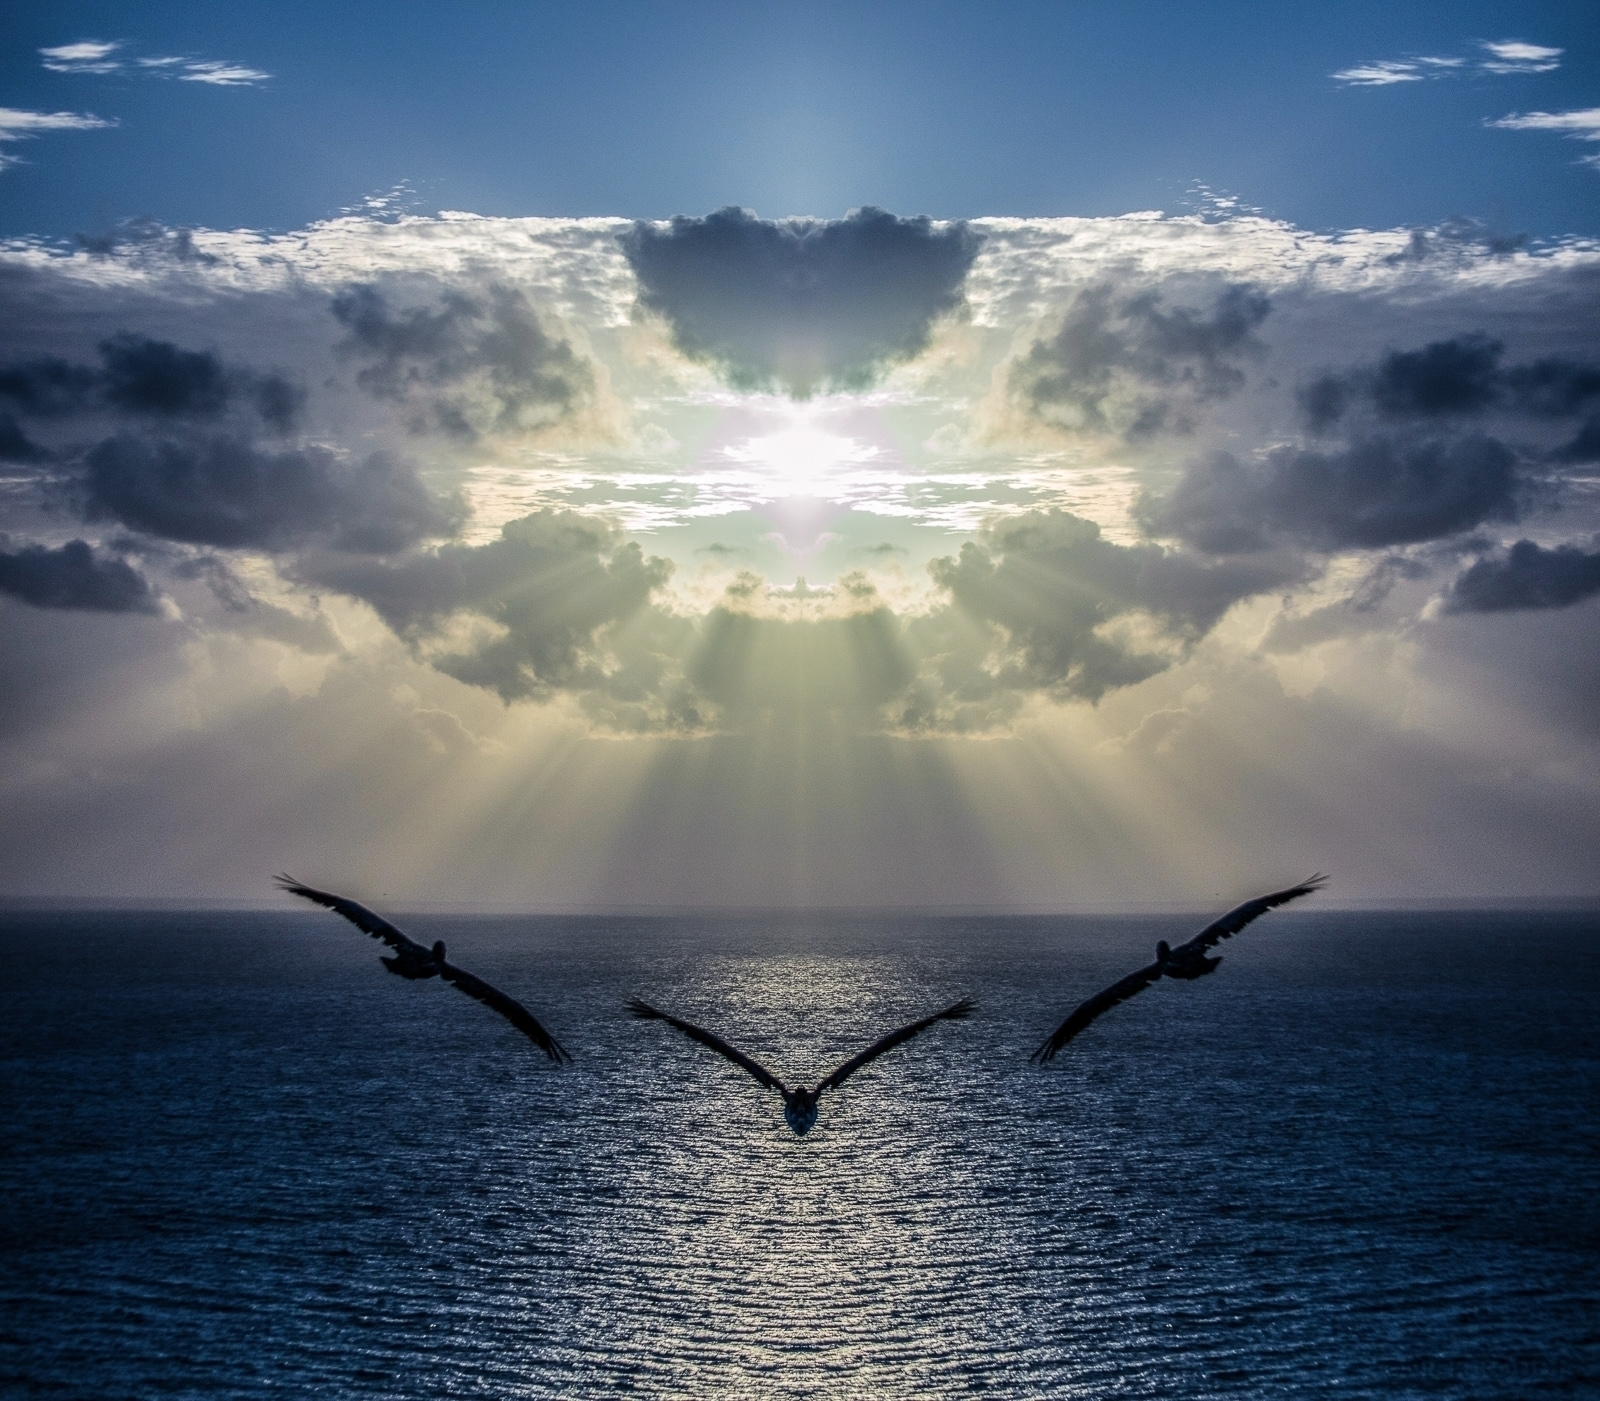 Pelicans soaring Mother Ship. c - koudis | ello